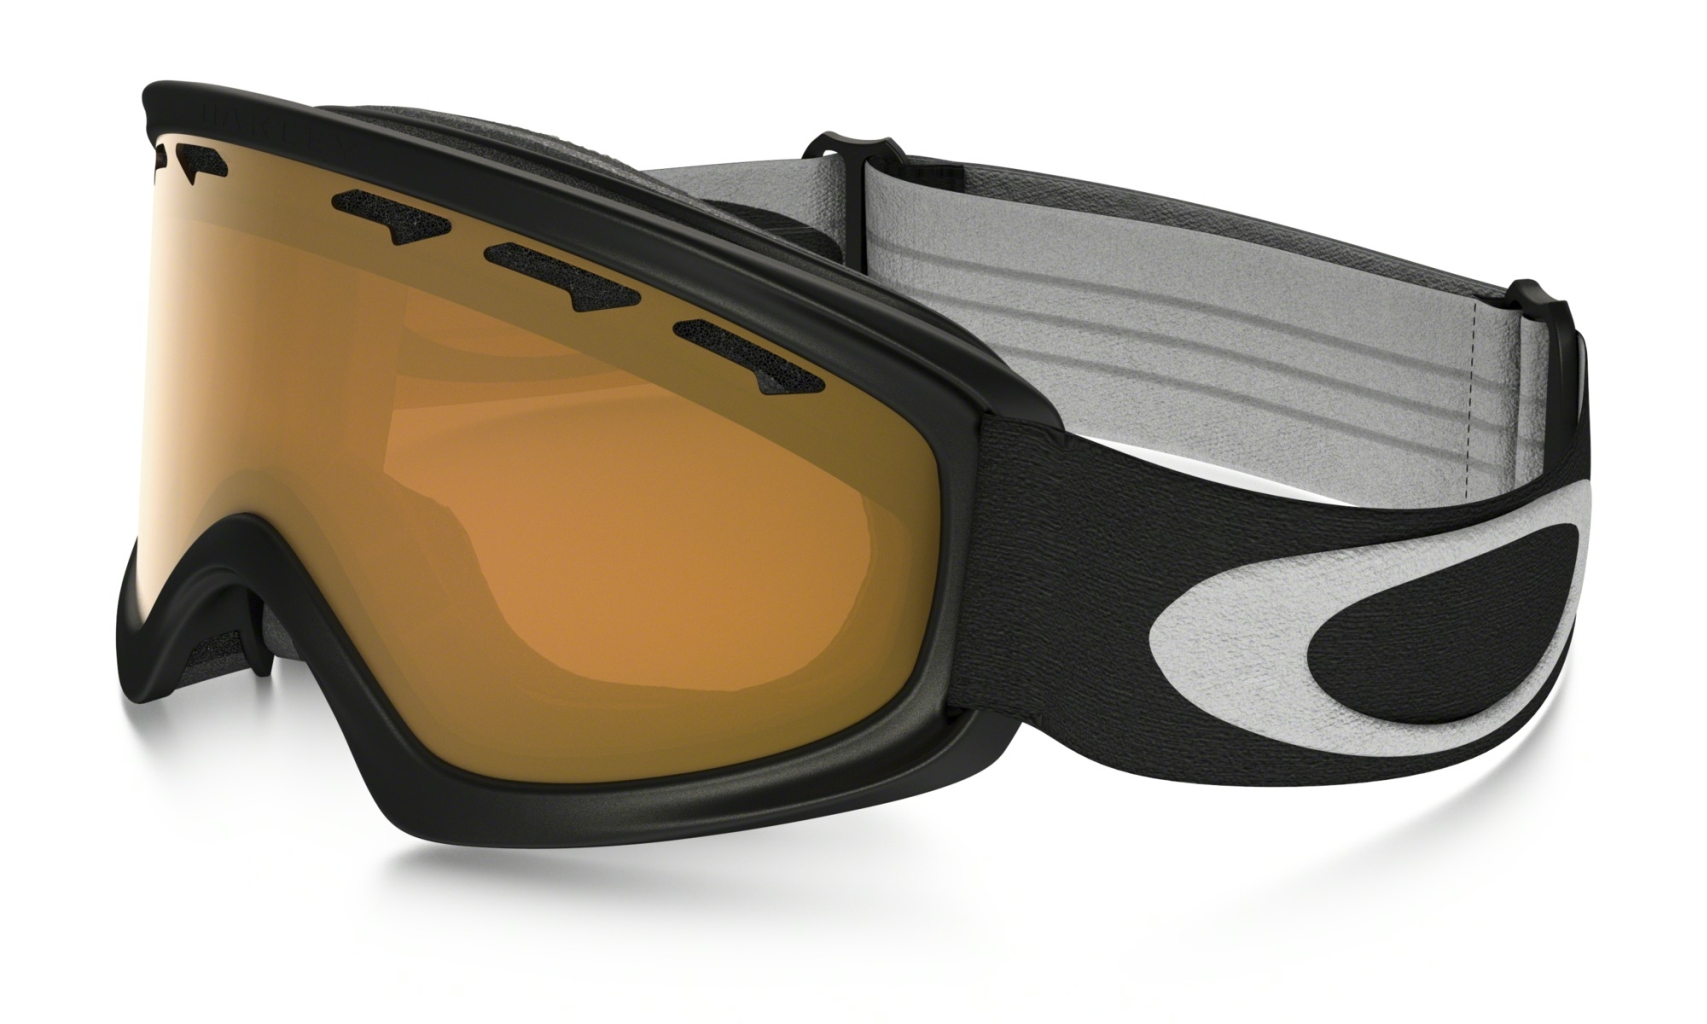 Oakley O2 Xs Matte Black w/Persimmon-30